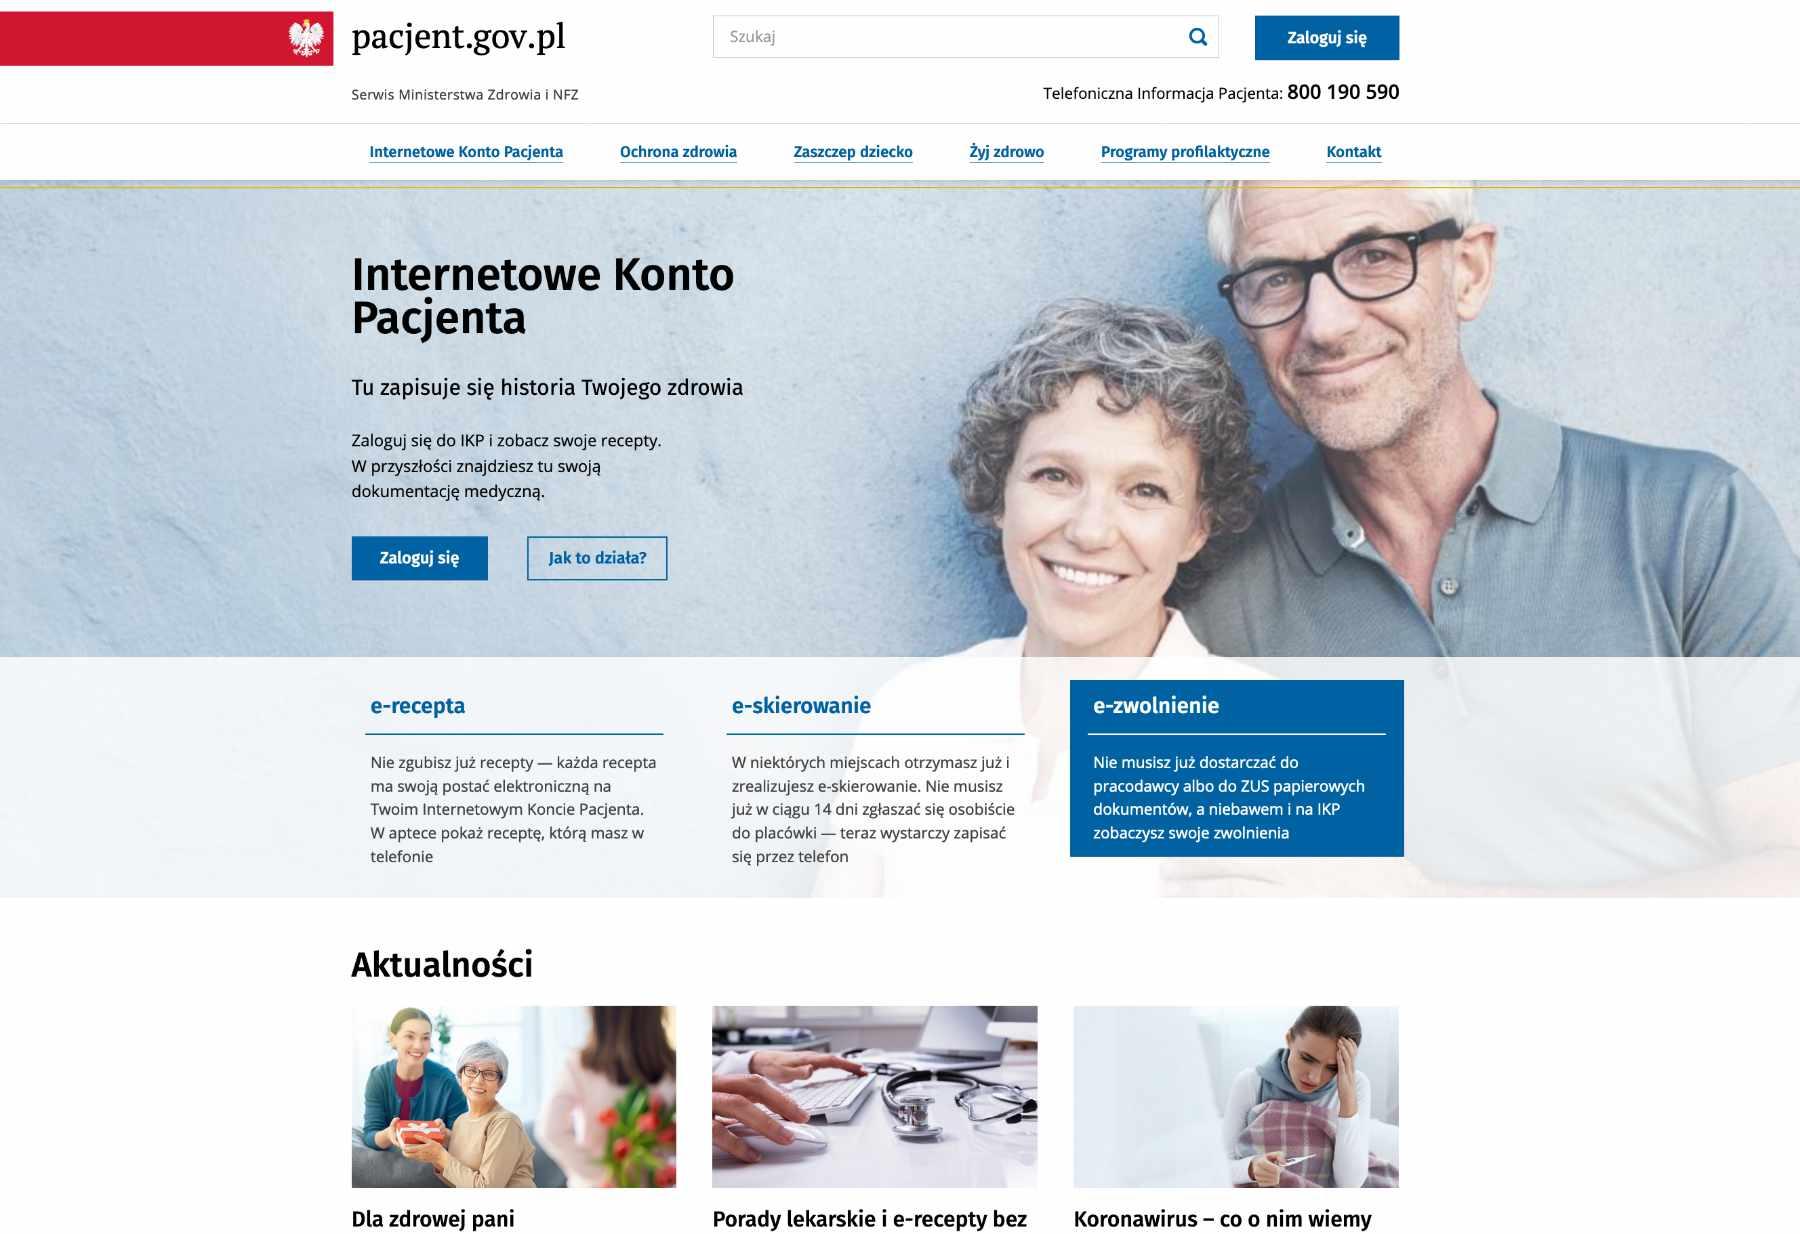 Screenshot Gesundheitsportal Polen. 10.3.2020.